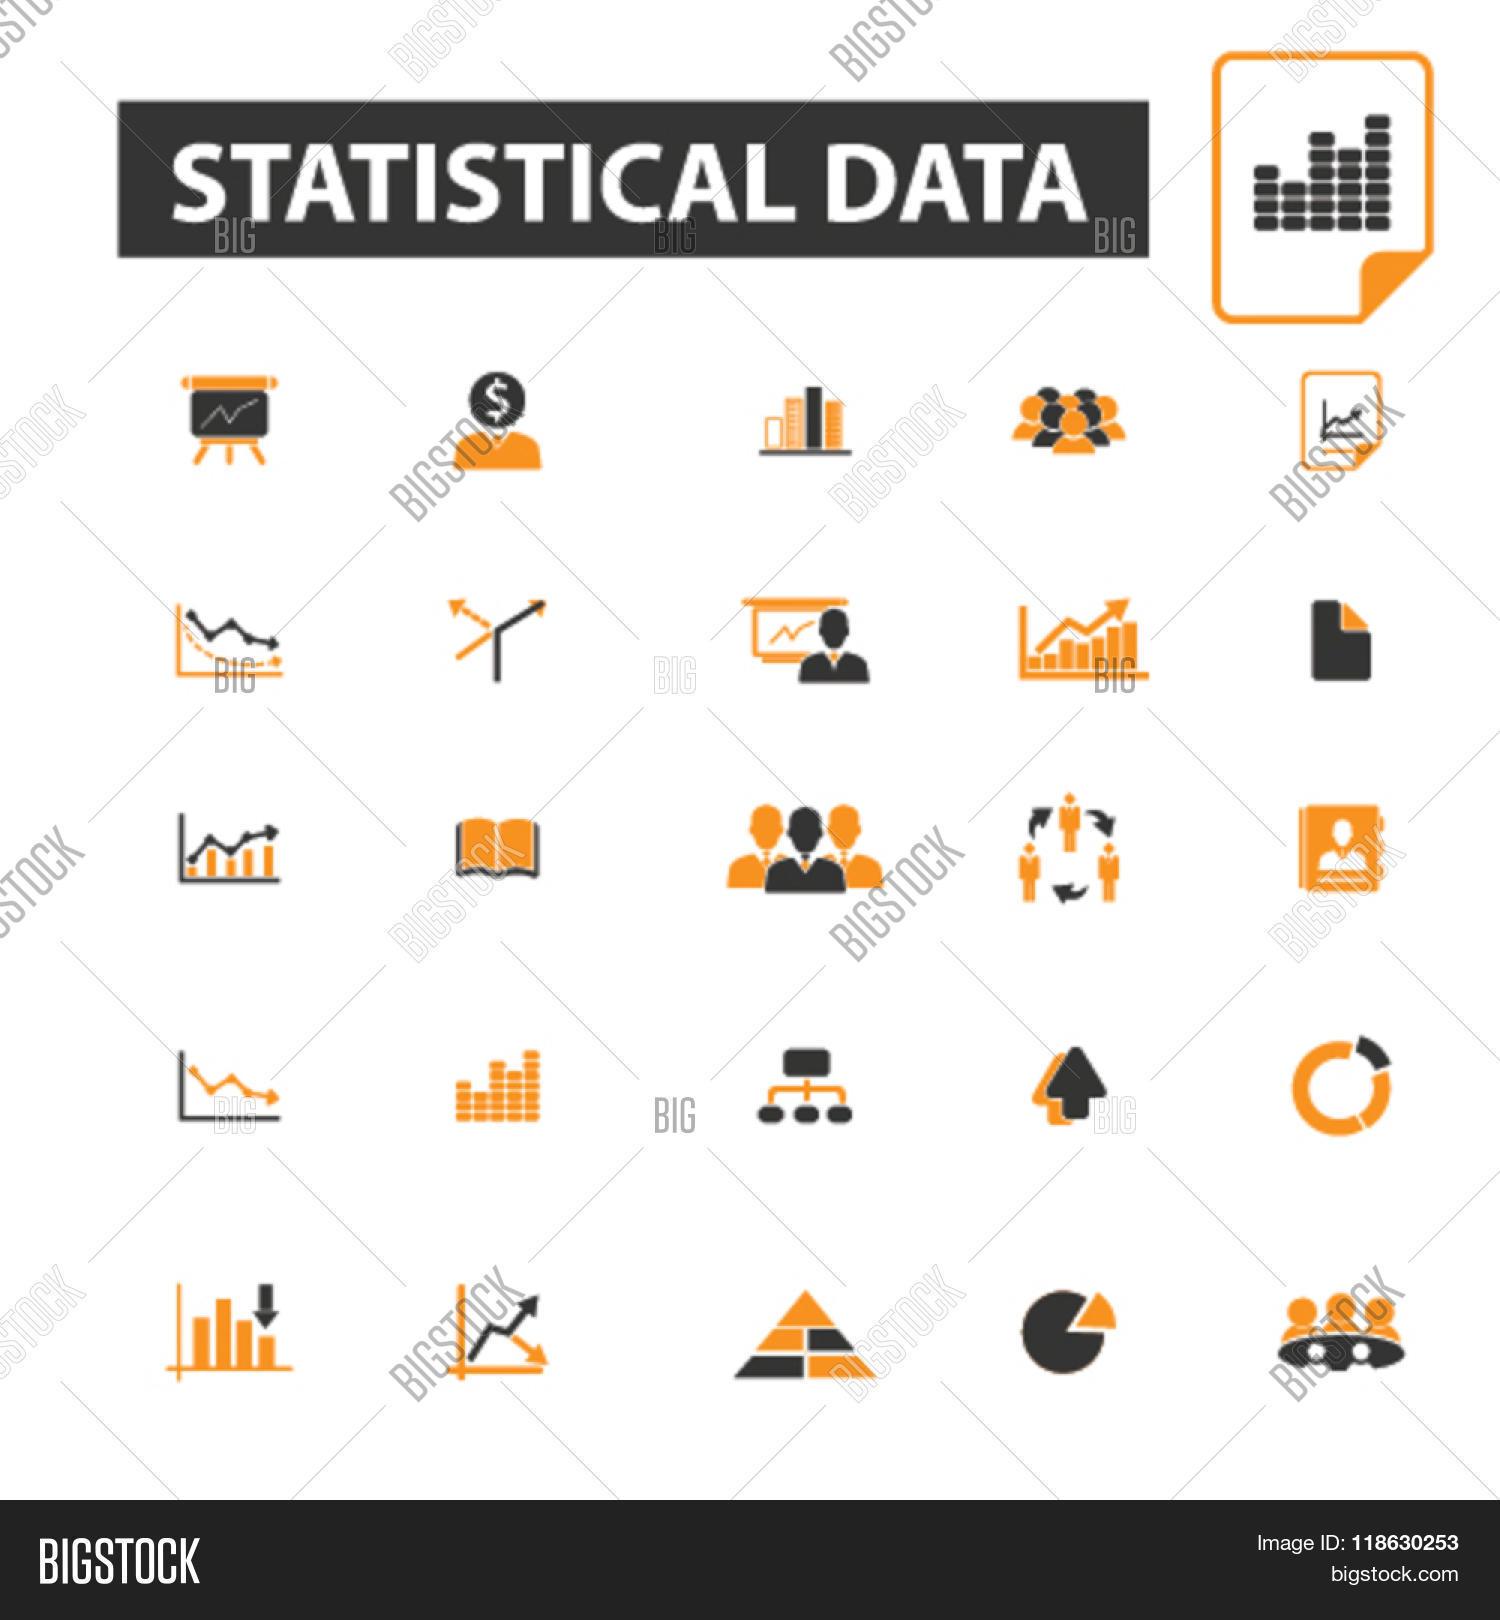 Statistical Data Icons, Vector & Photo   Bigstock